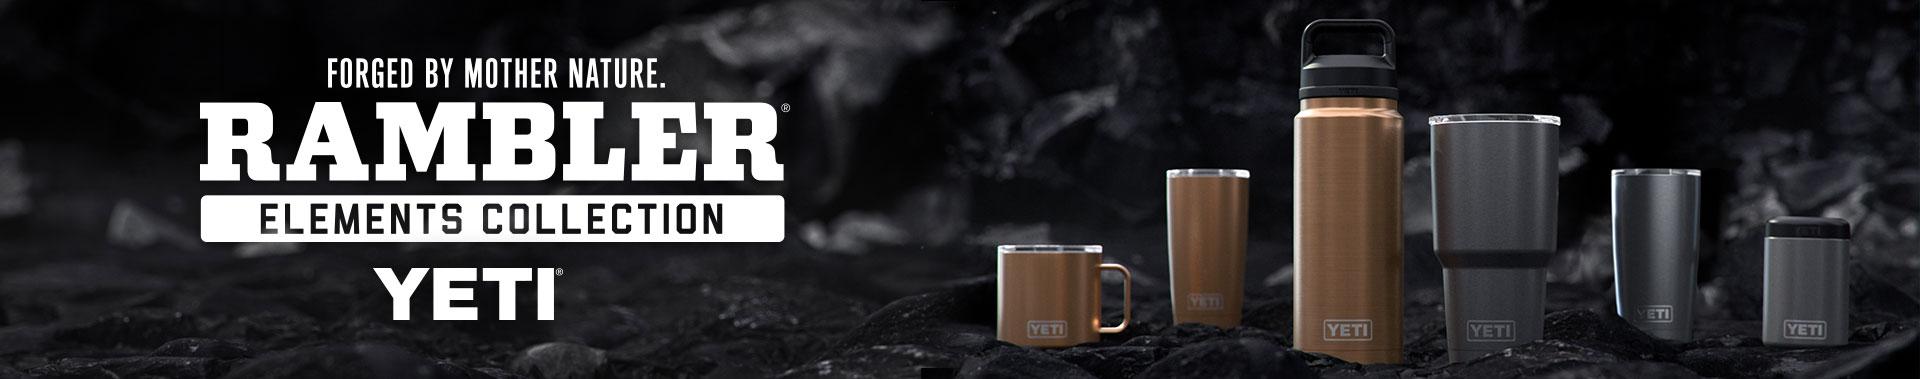 Yeti - Rambler Elements Collection